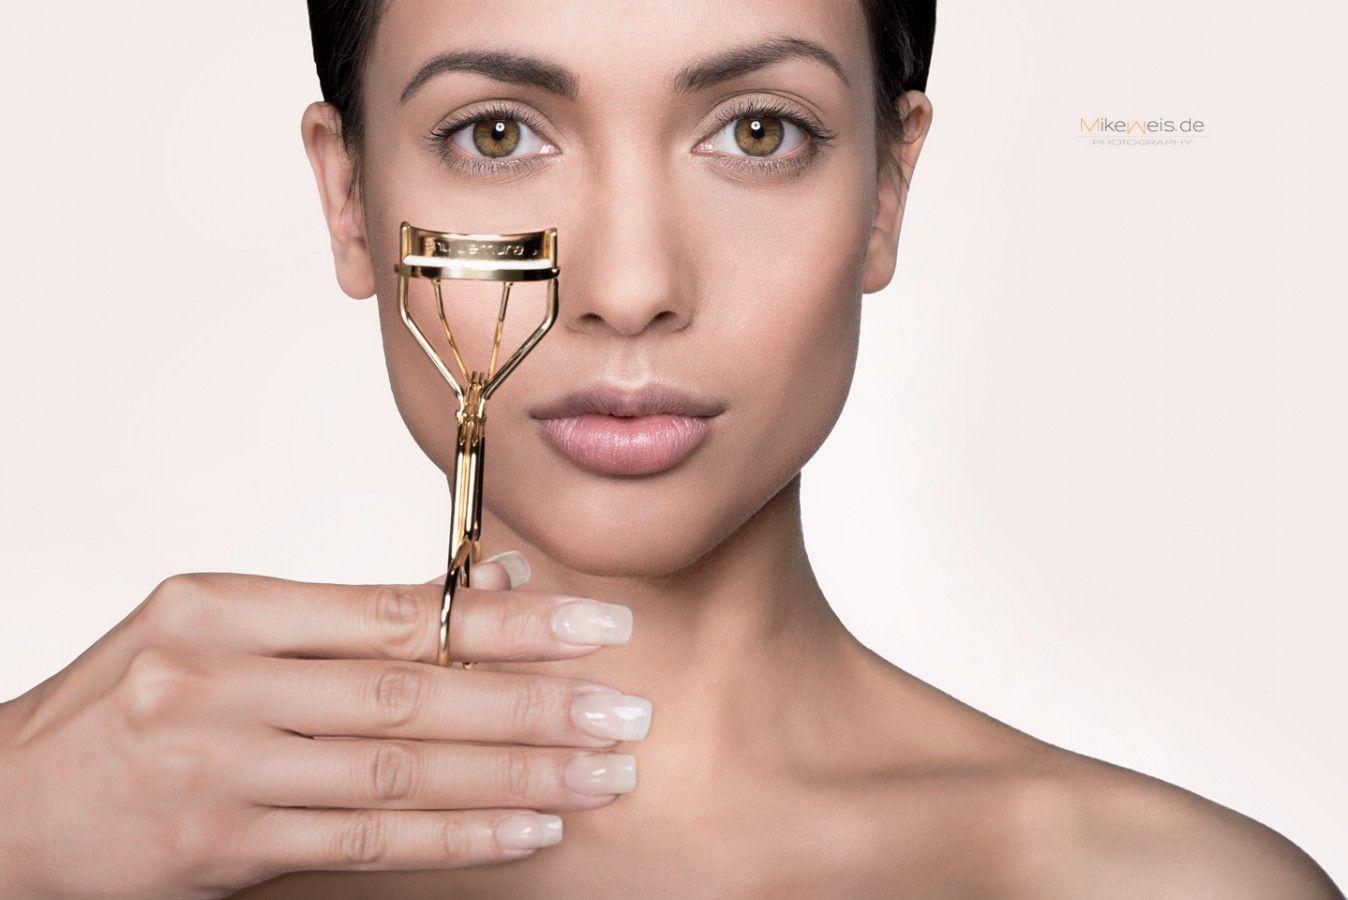 Strecke Clean › Mike Weis | PHOTODESIGN | Make up, Models